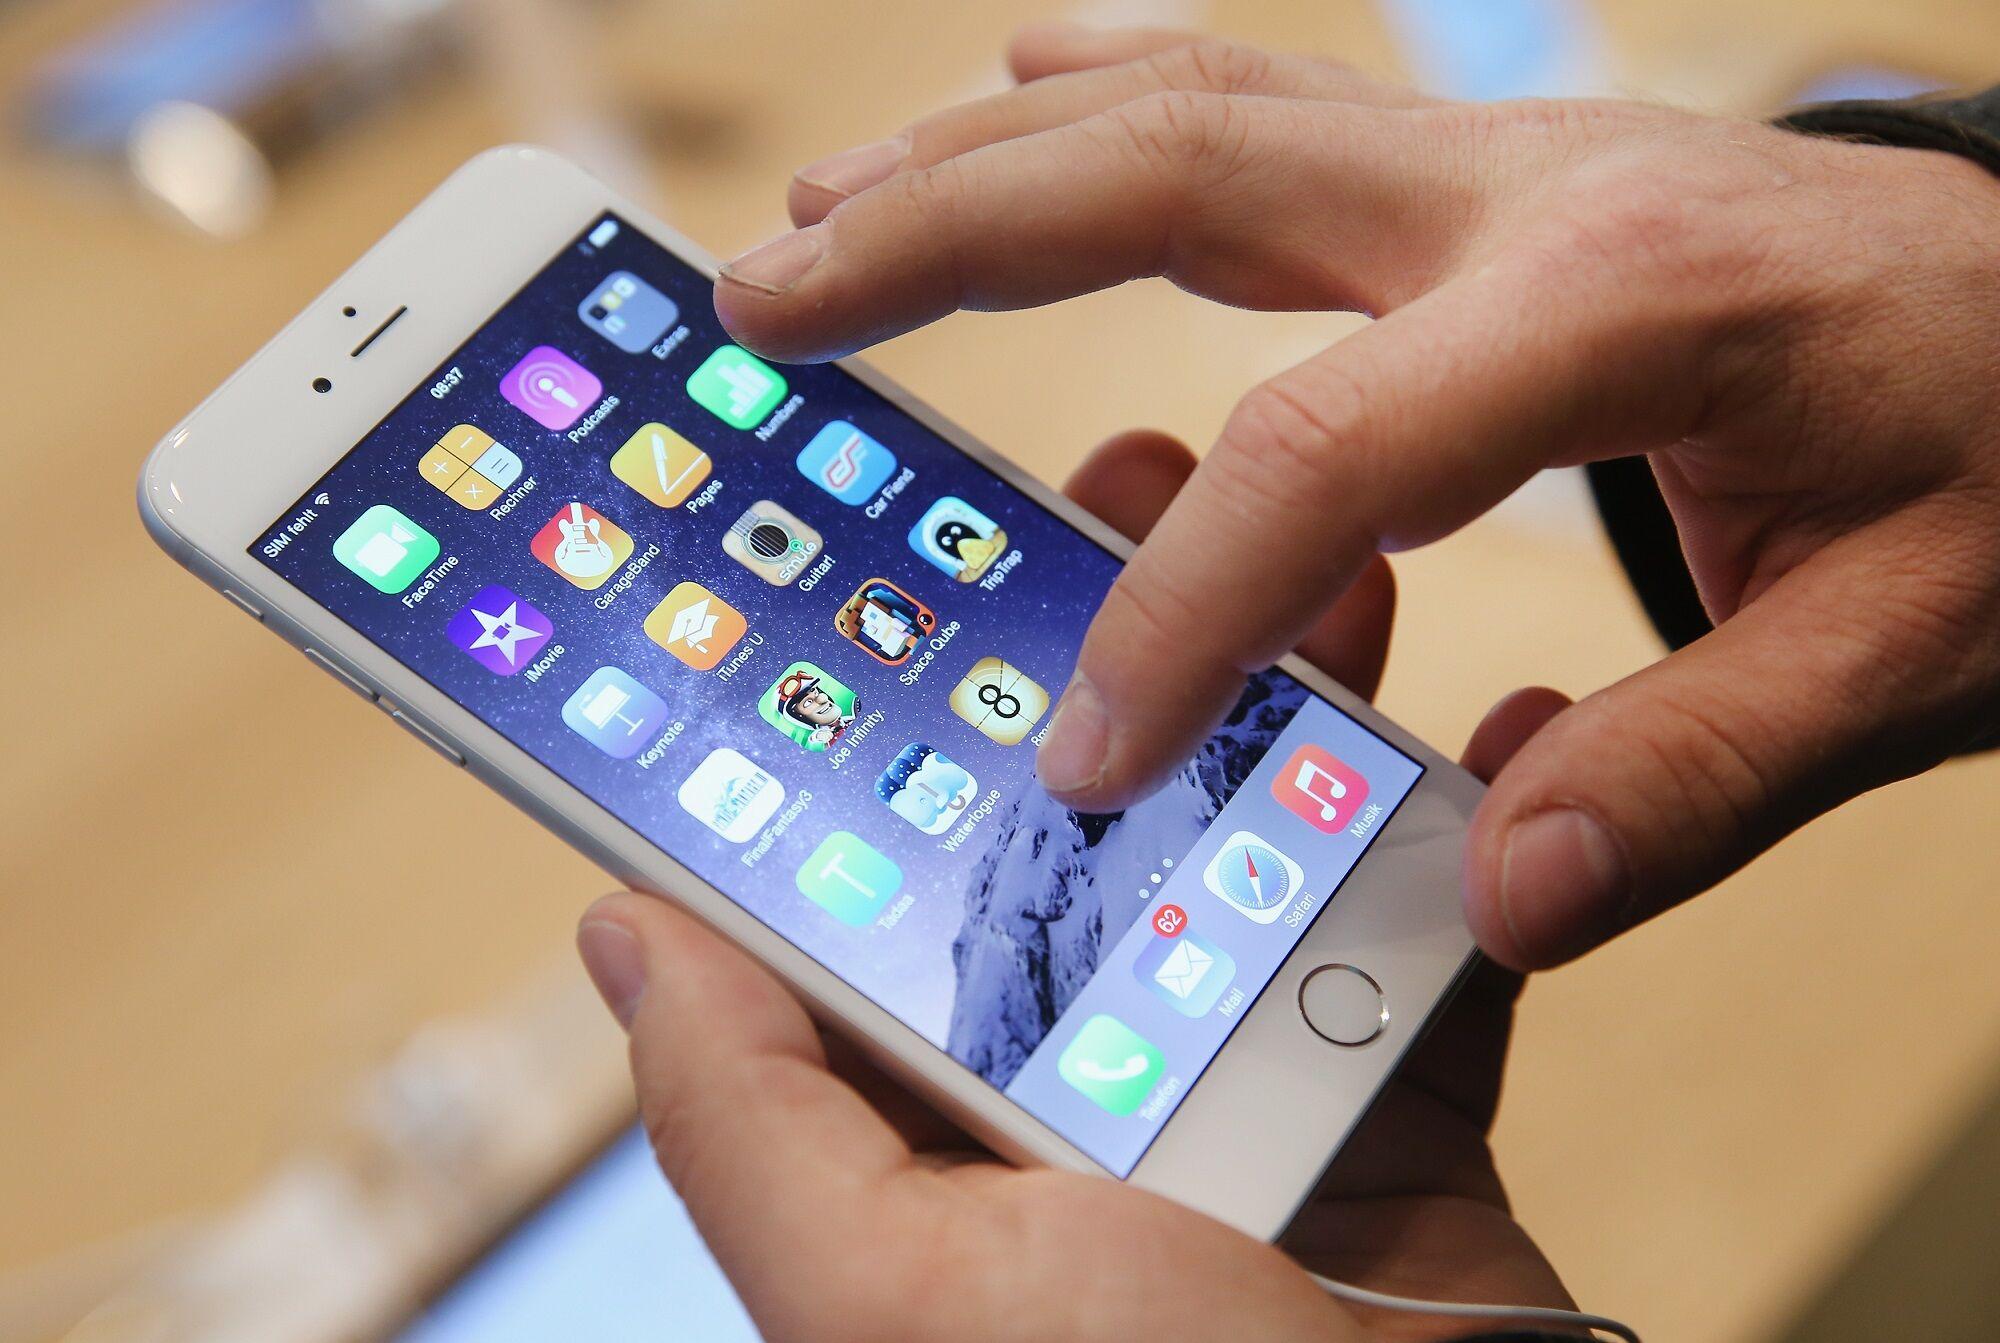 Jangan tekan layar smartphone